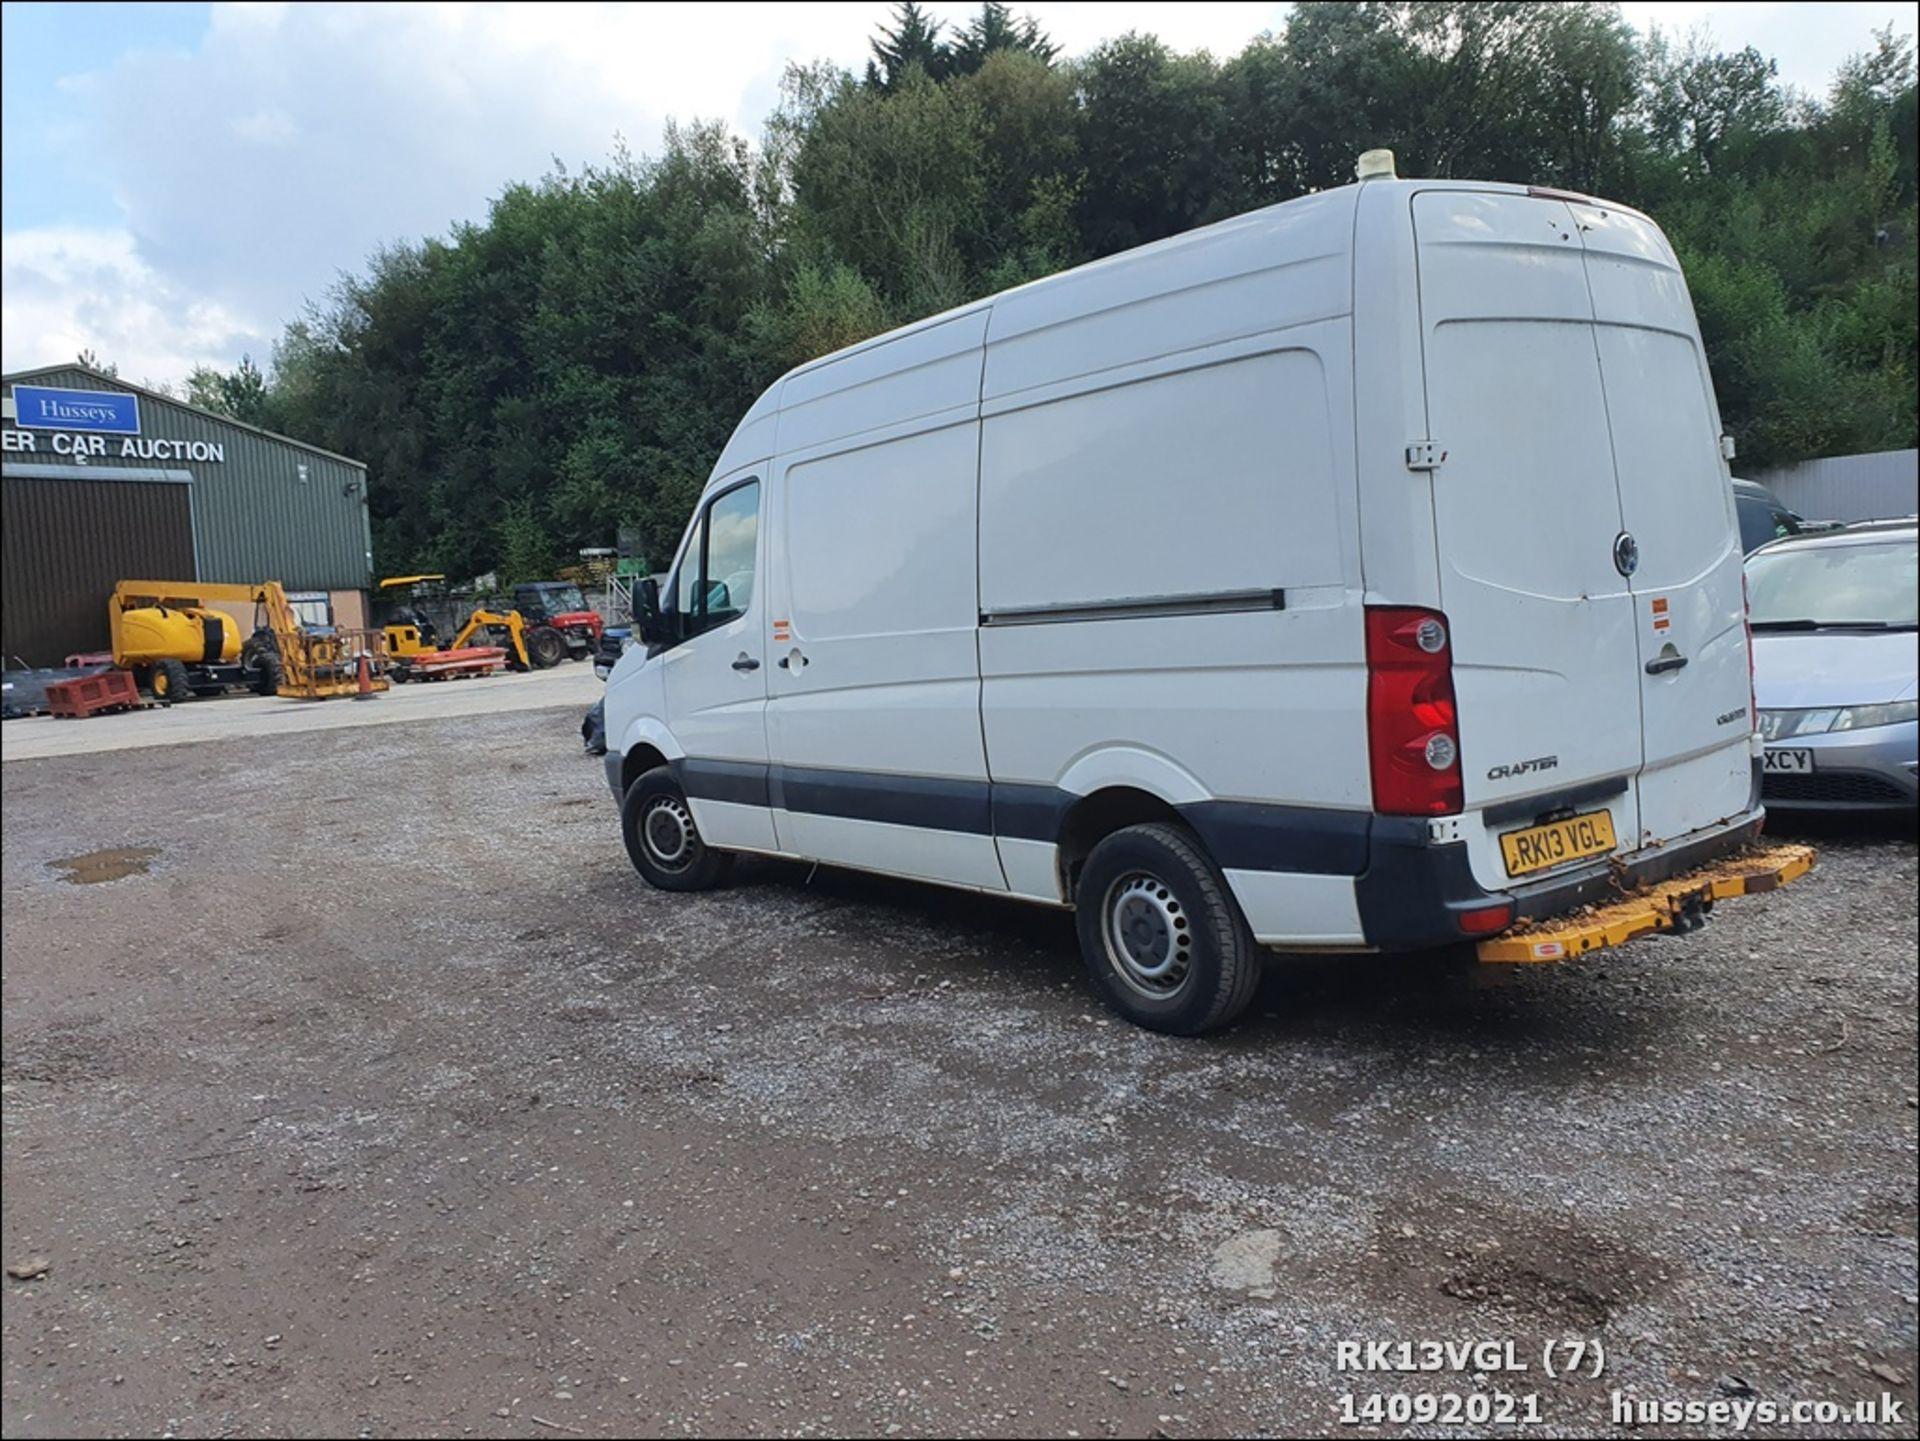 13/13 VOLKSWAGEN CRAFTER CR35 TDI 143 MWB - 1968cc 5dr Van (White, 75k) - Image 7 of 13